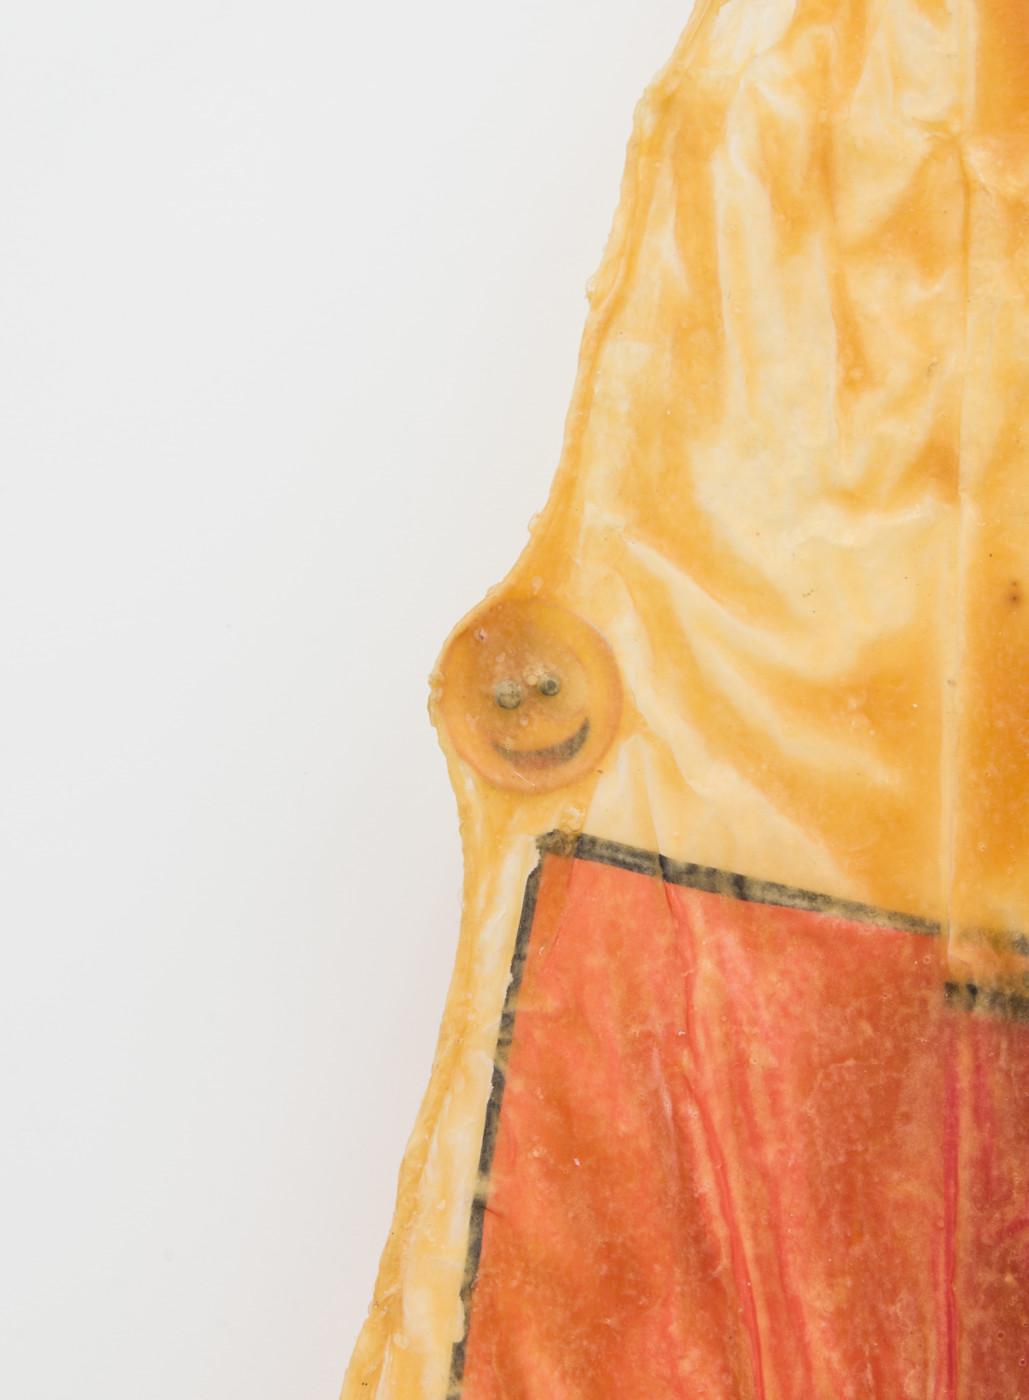 DEEPER THAN INSIDE Olga Balema  Untitled</I> (detail), 2014 UV print on plastic, paper, latex 146 x 79 cm / 57.5 x 31.1 in Theodora Allen  Olga Balema  Adam Gordon  Tom Humphreys  Dawn Mellor  Ragen Moss  Rolf Nowotny  Benjamin Reiss  Dylan Vandenhoeck